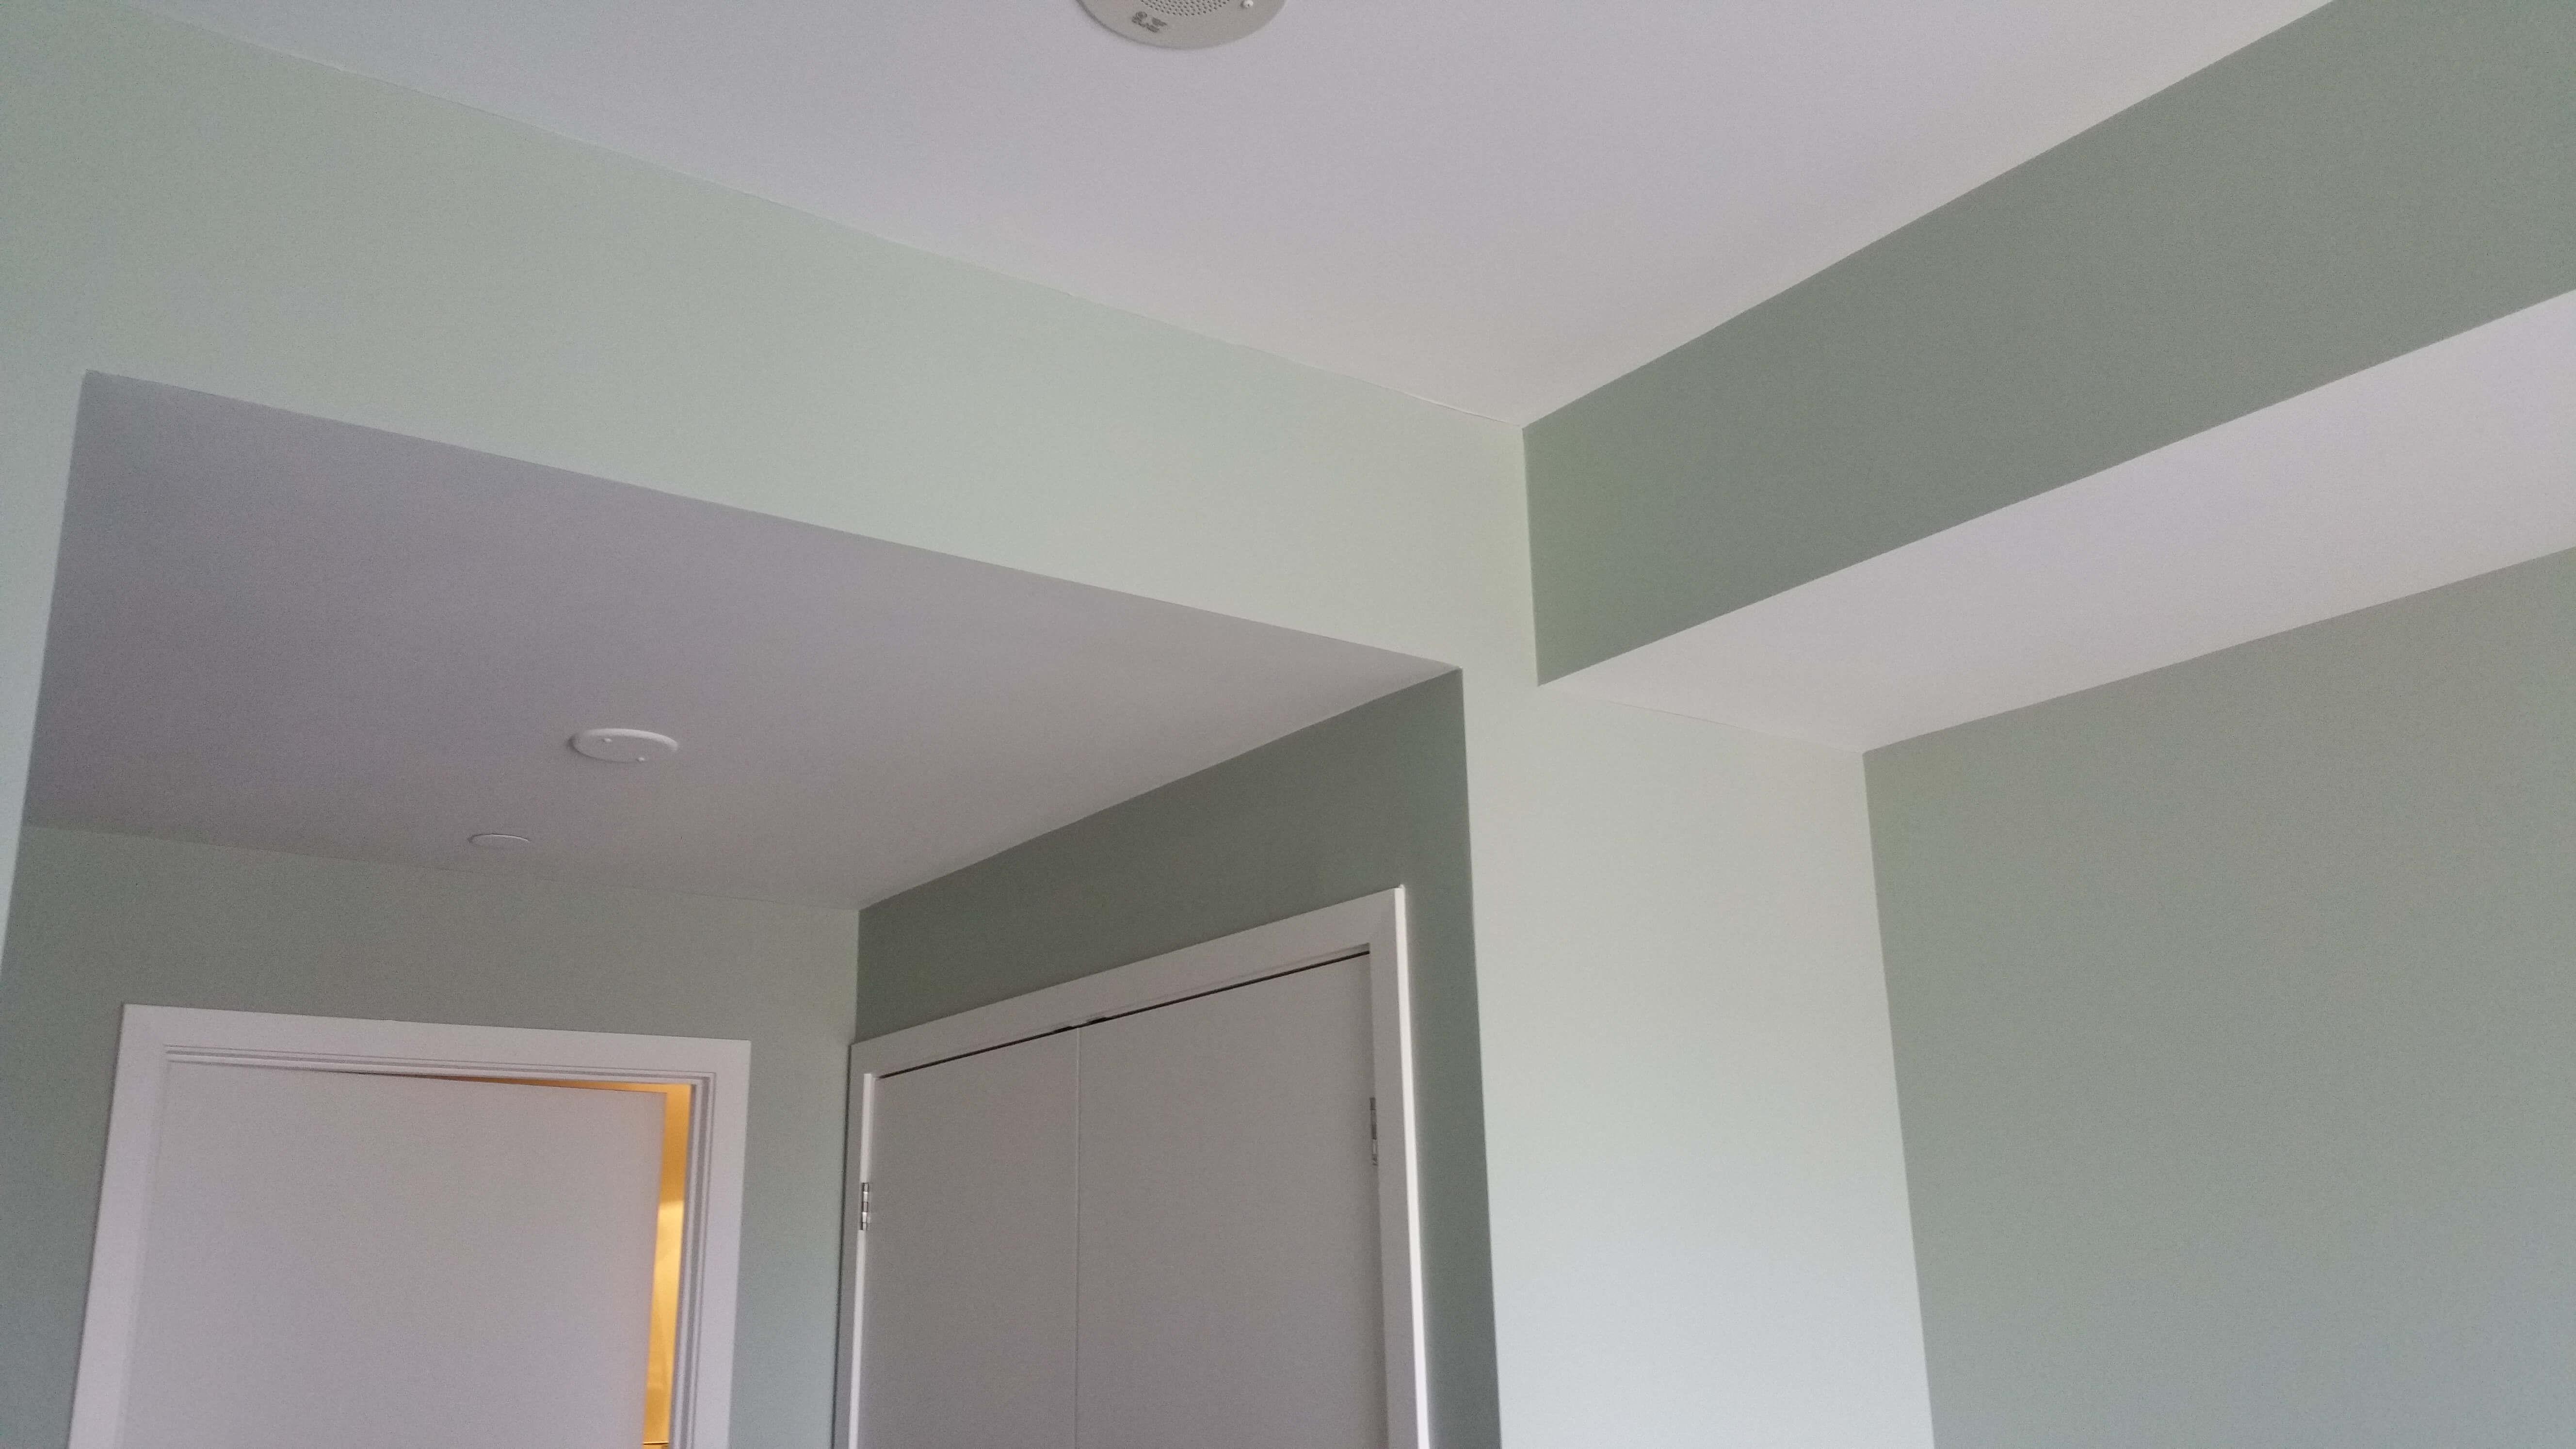 Condo Painters Pro Toronto Professional Home Painting